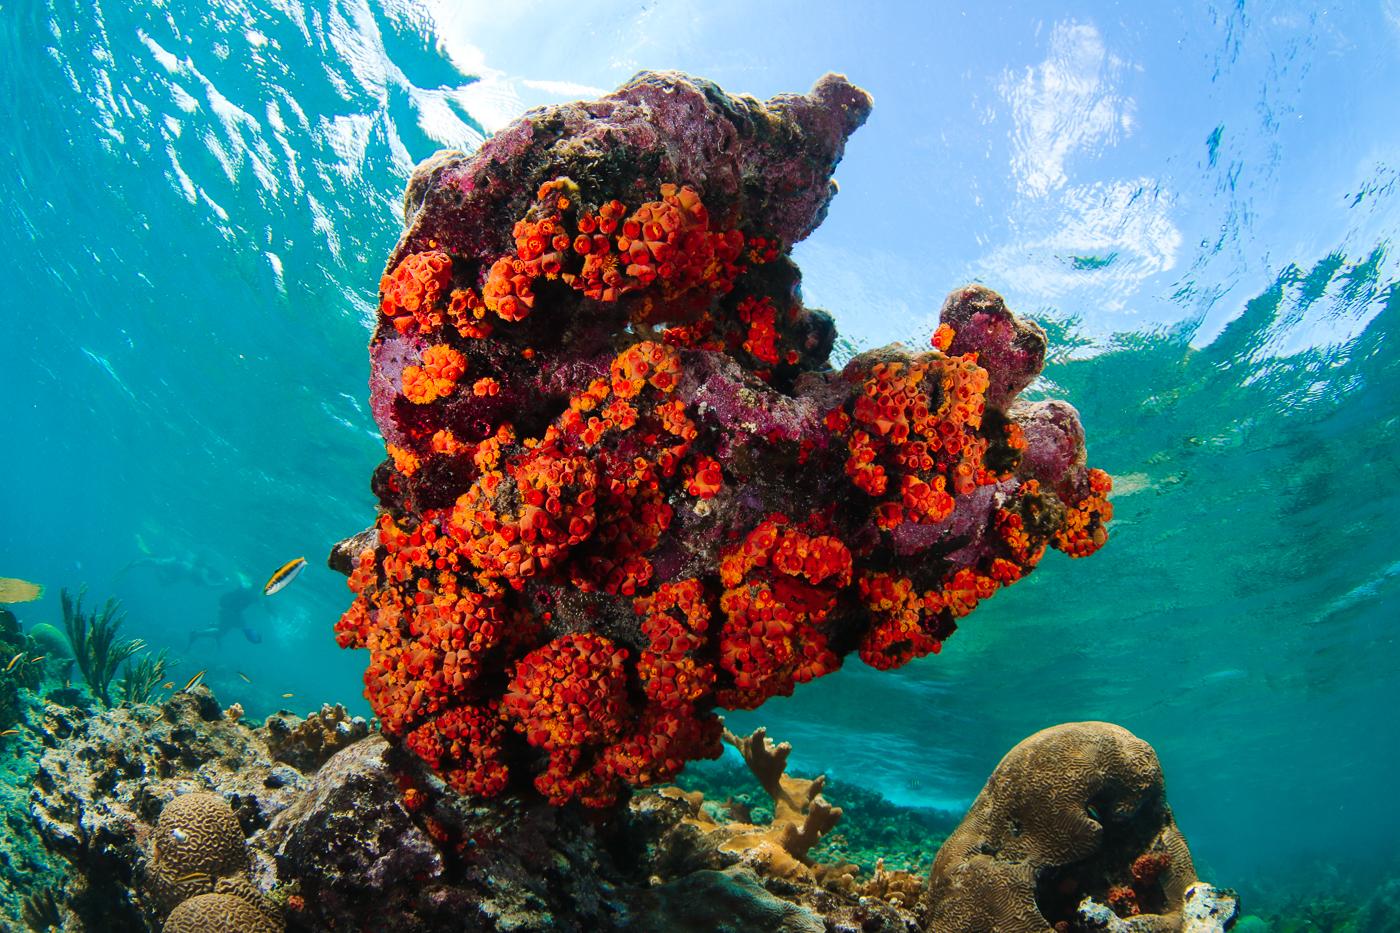 heart of sponges